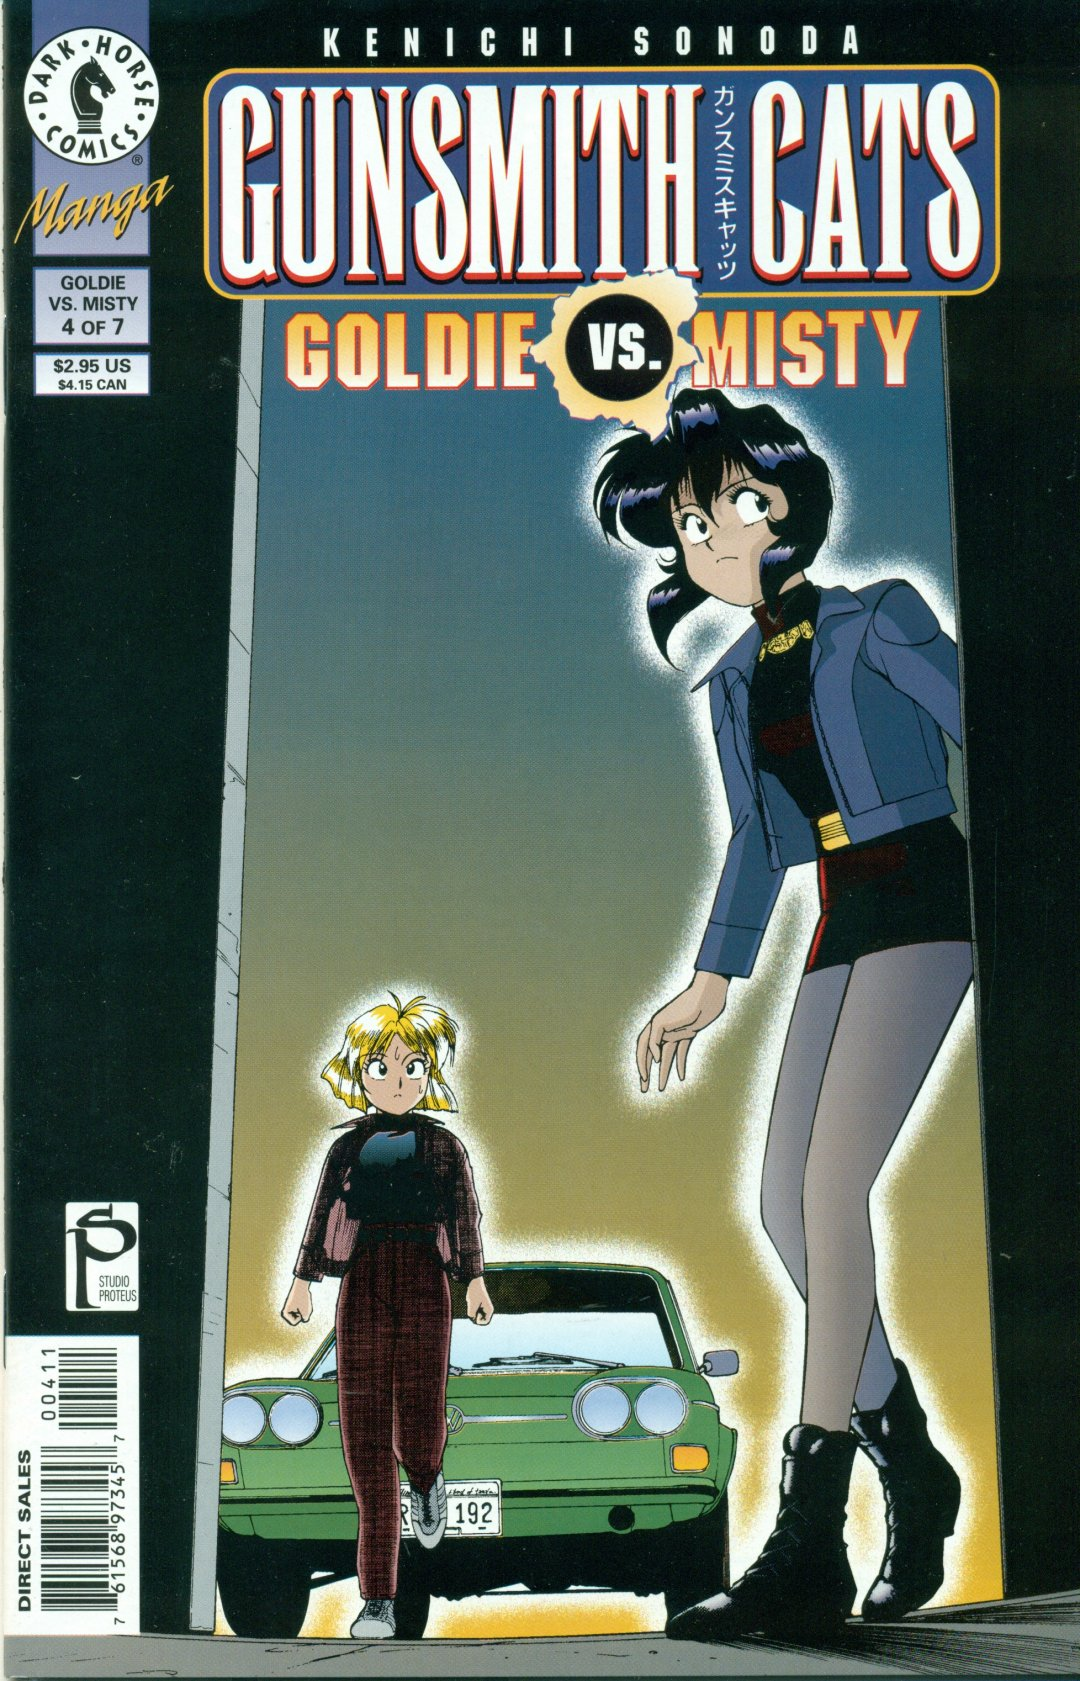 of 7 Gunsmith Cats Goldie vs Misty 6 - Dark Horse Comics